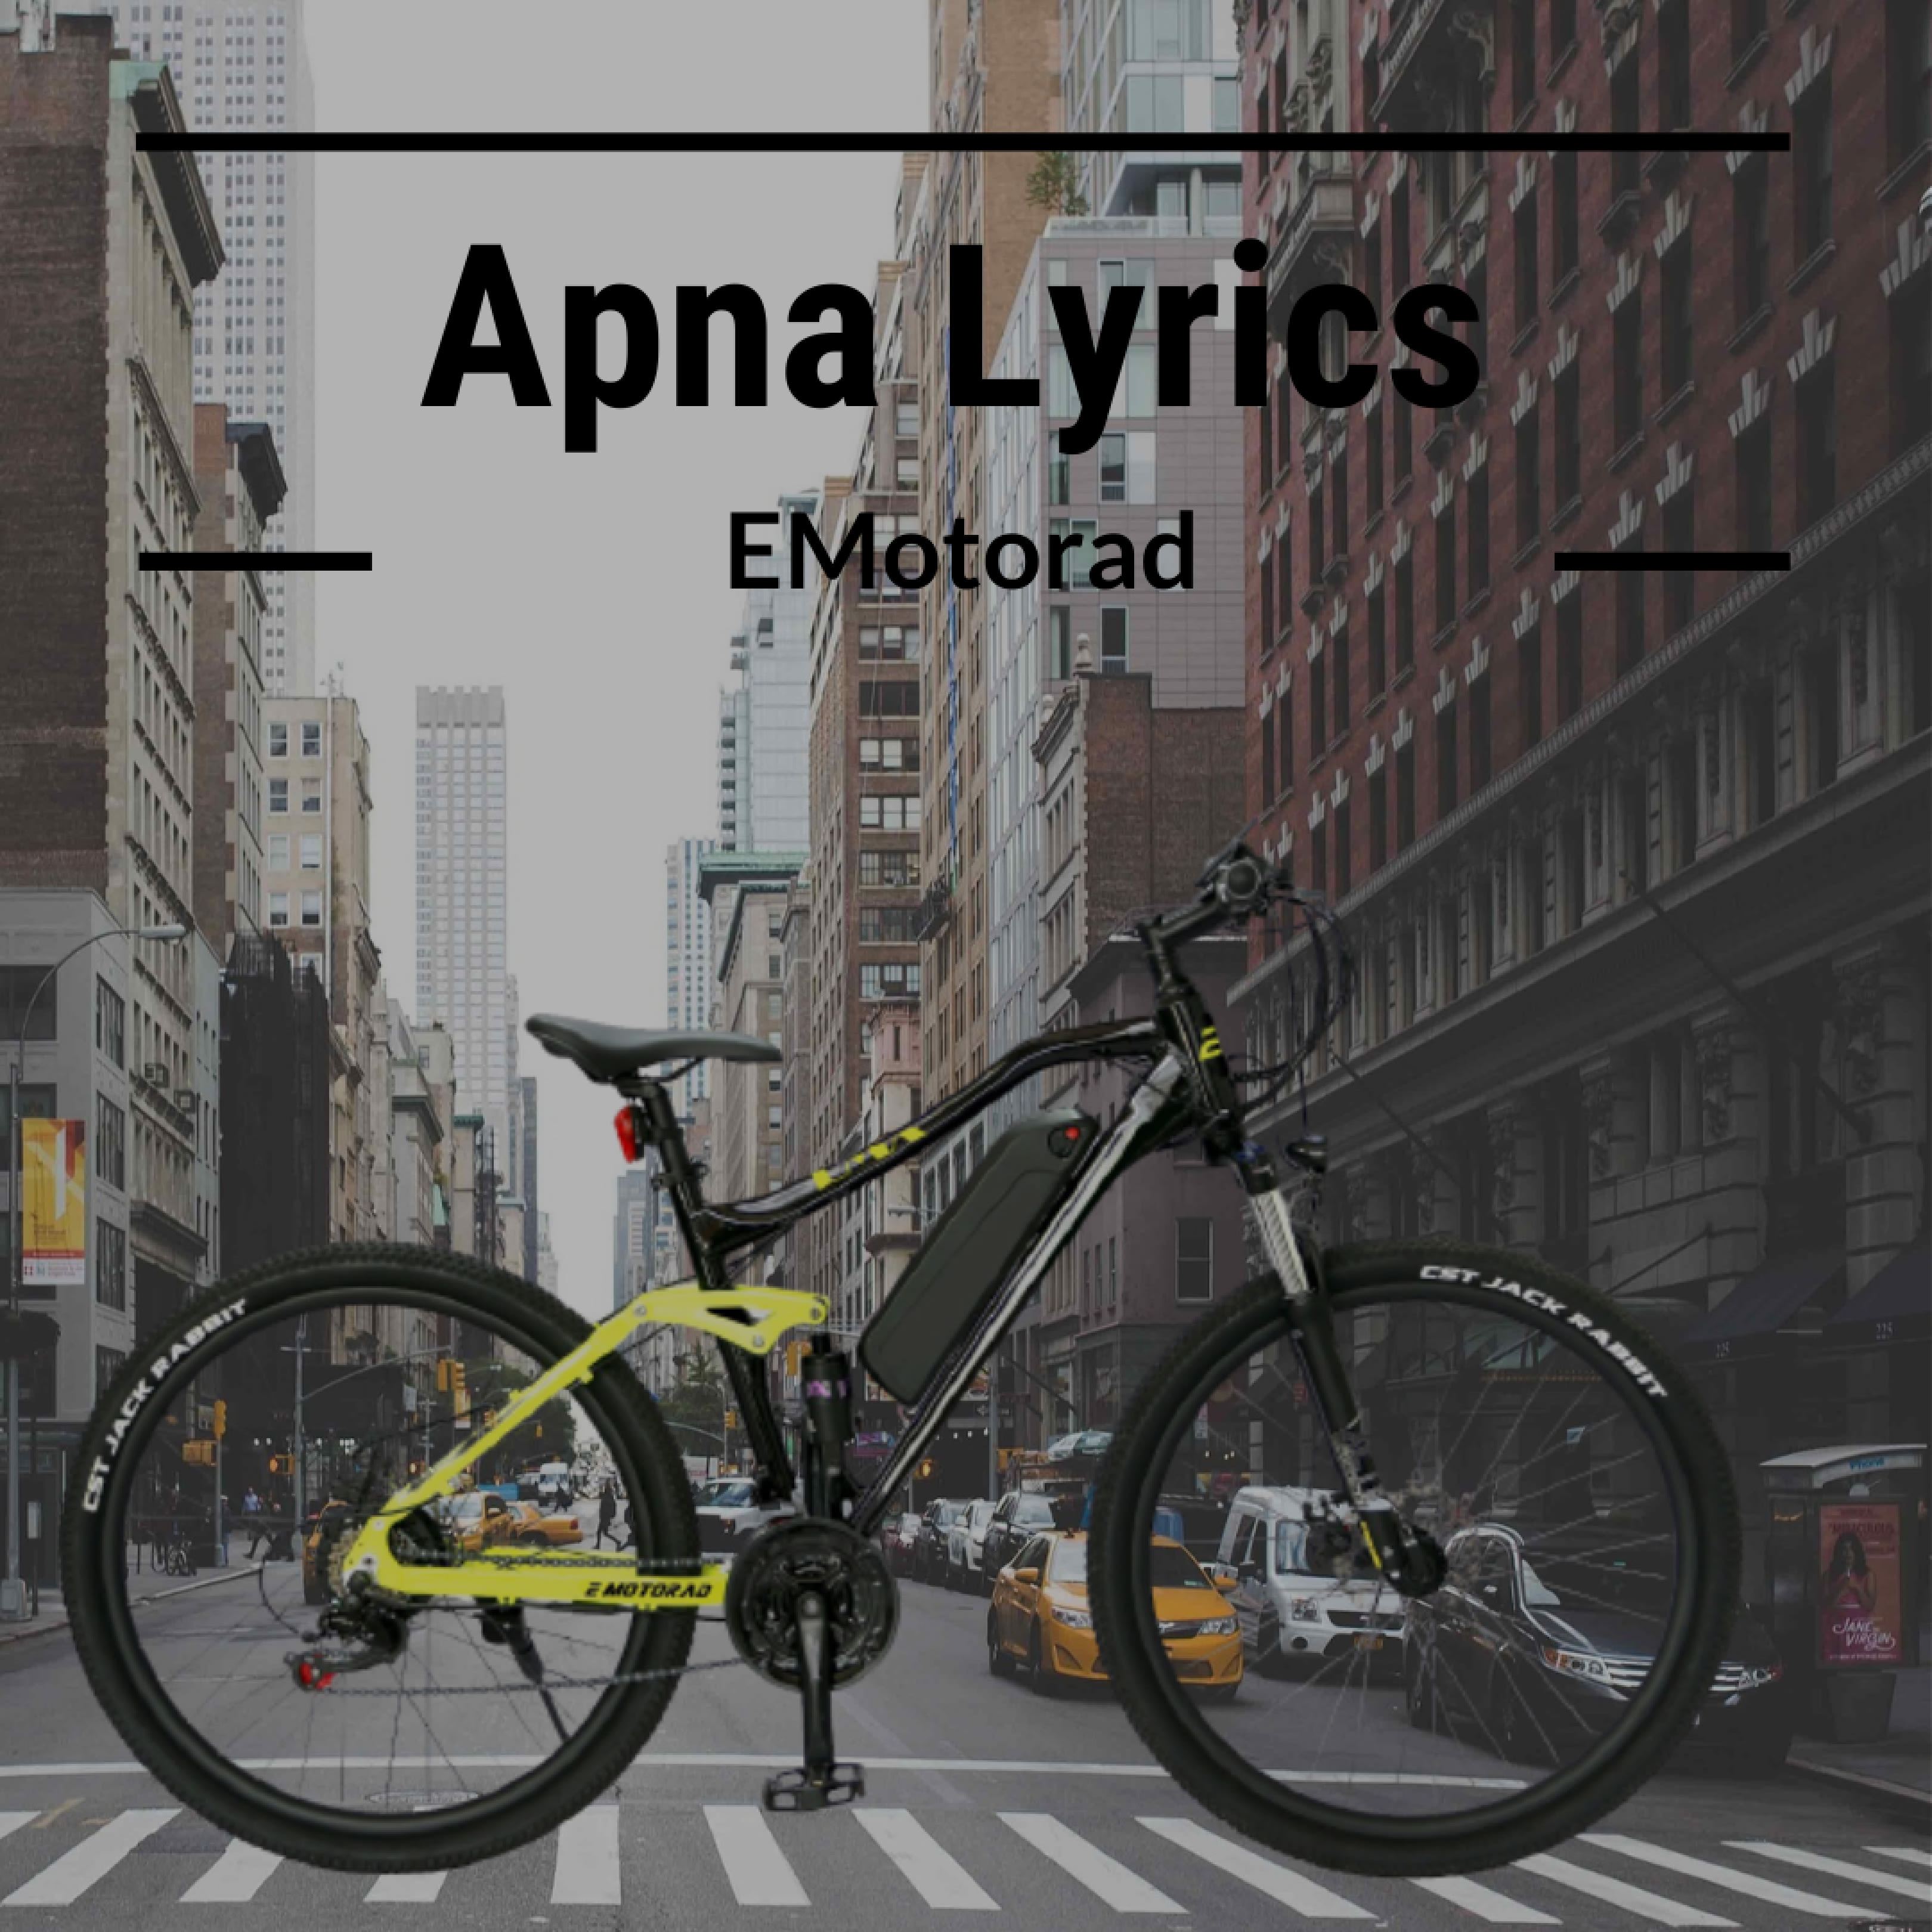 Apna Lyrics